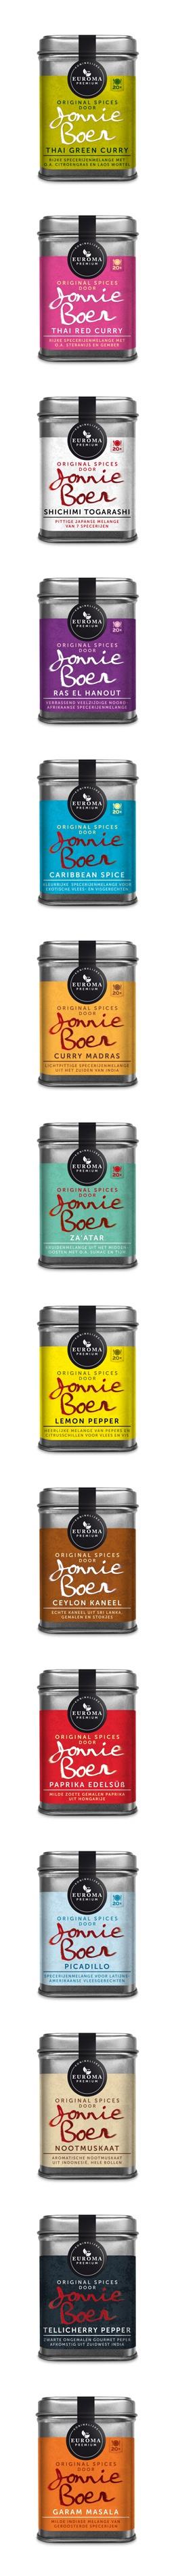 The Jonnie Boer packaging.